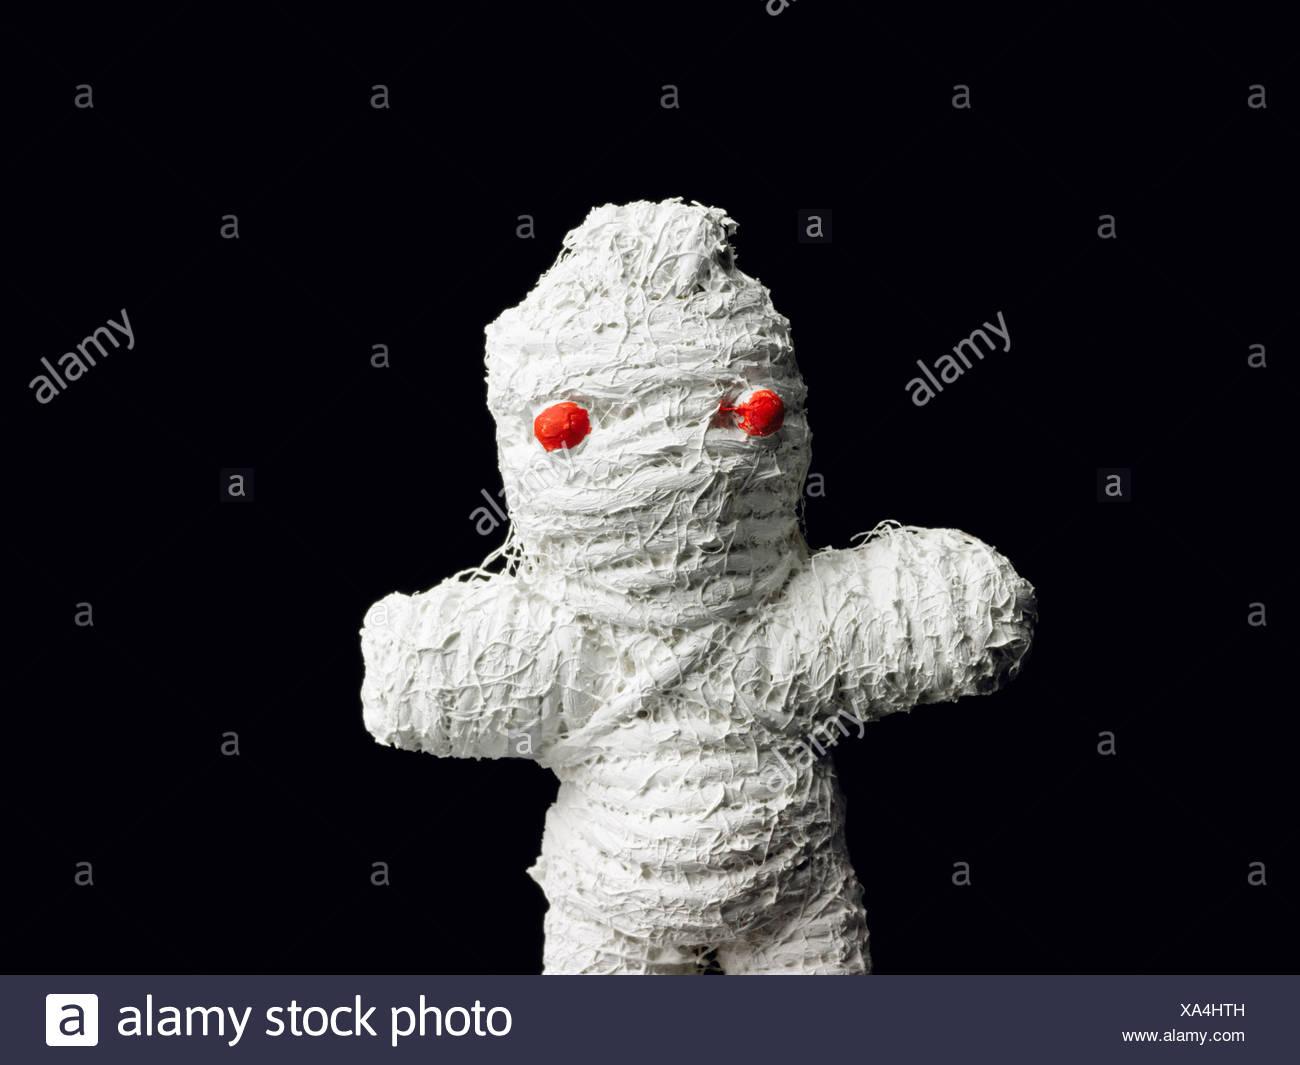 Voodoo doll - Stock Image